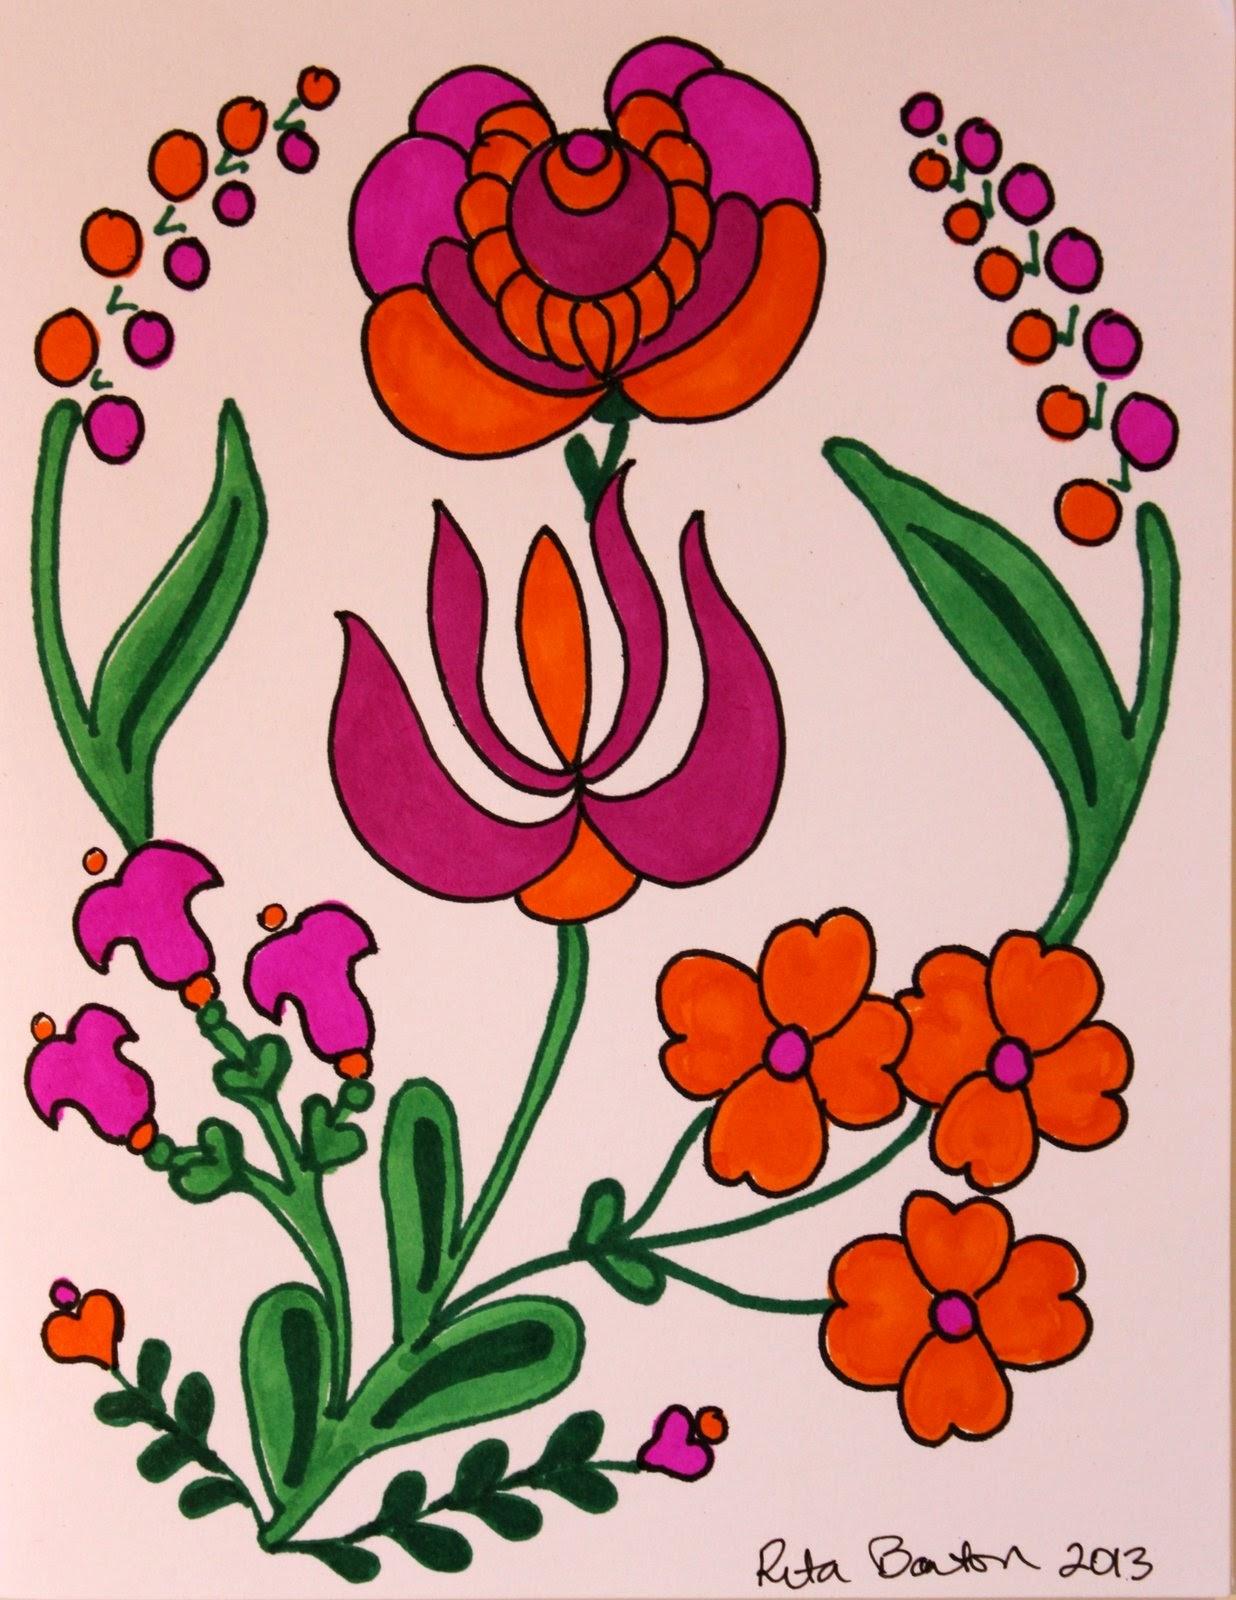 Rita Barton: Orange & Hot Pink for Summer of Color 2013